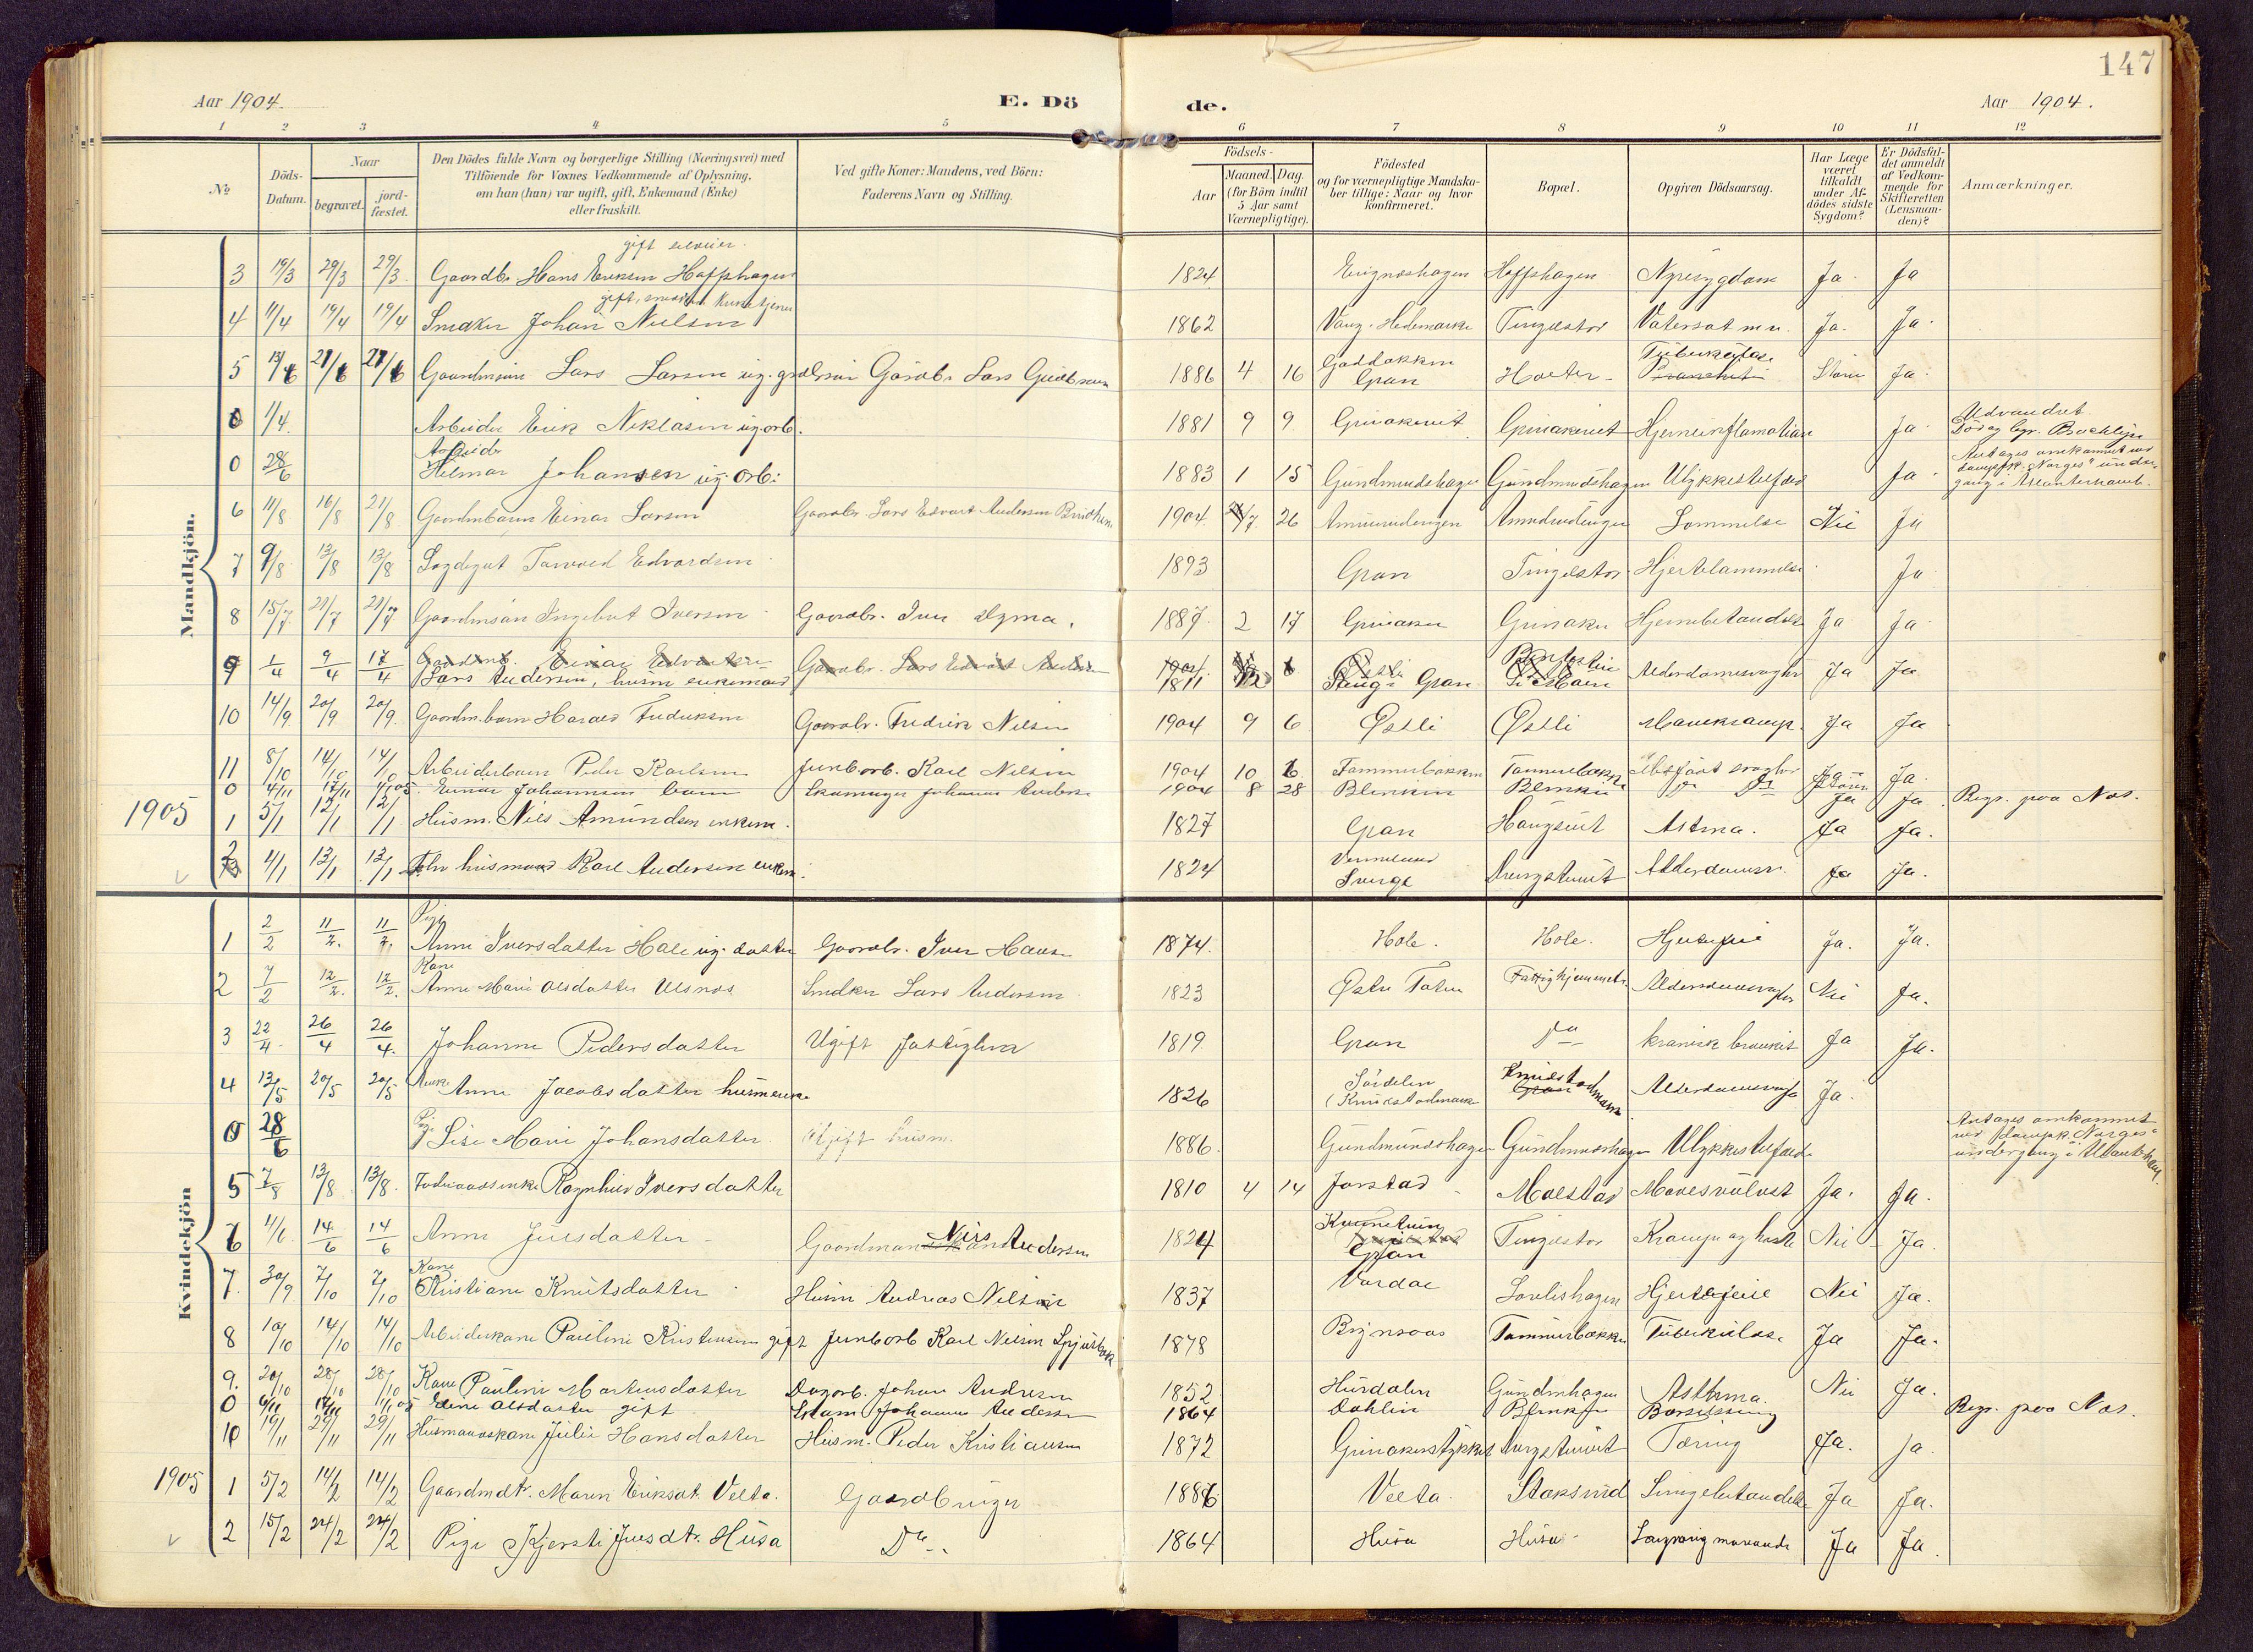 SAH, Brandbu prestekontor, Klokkerbok nr. 9, 1903-1916, s. 147